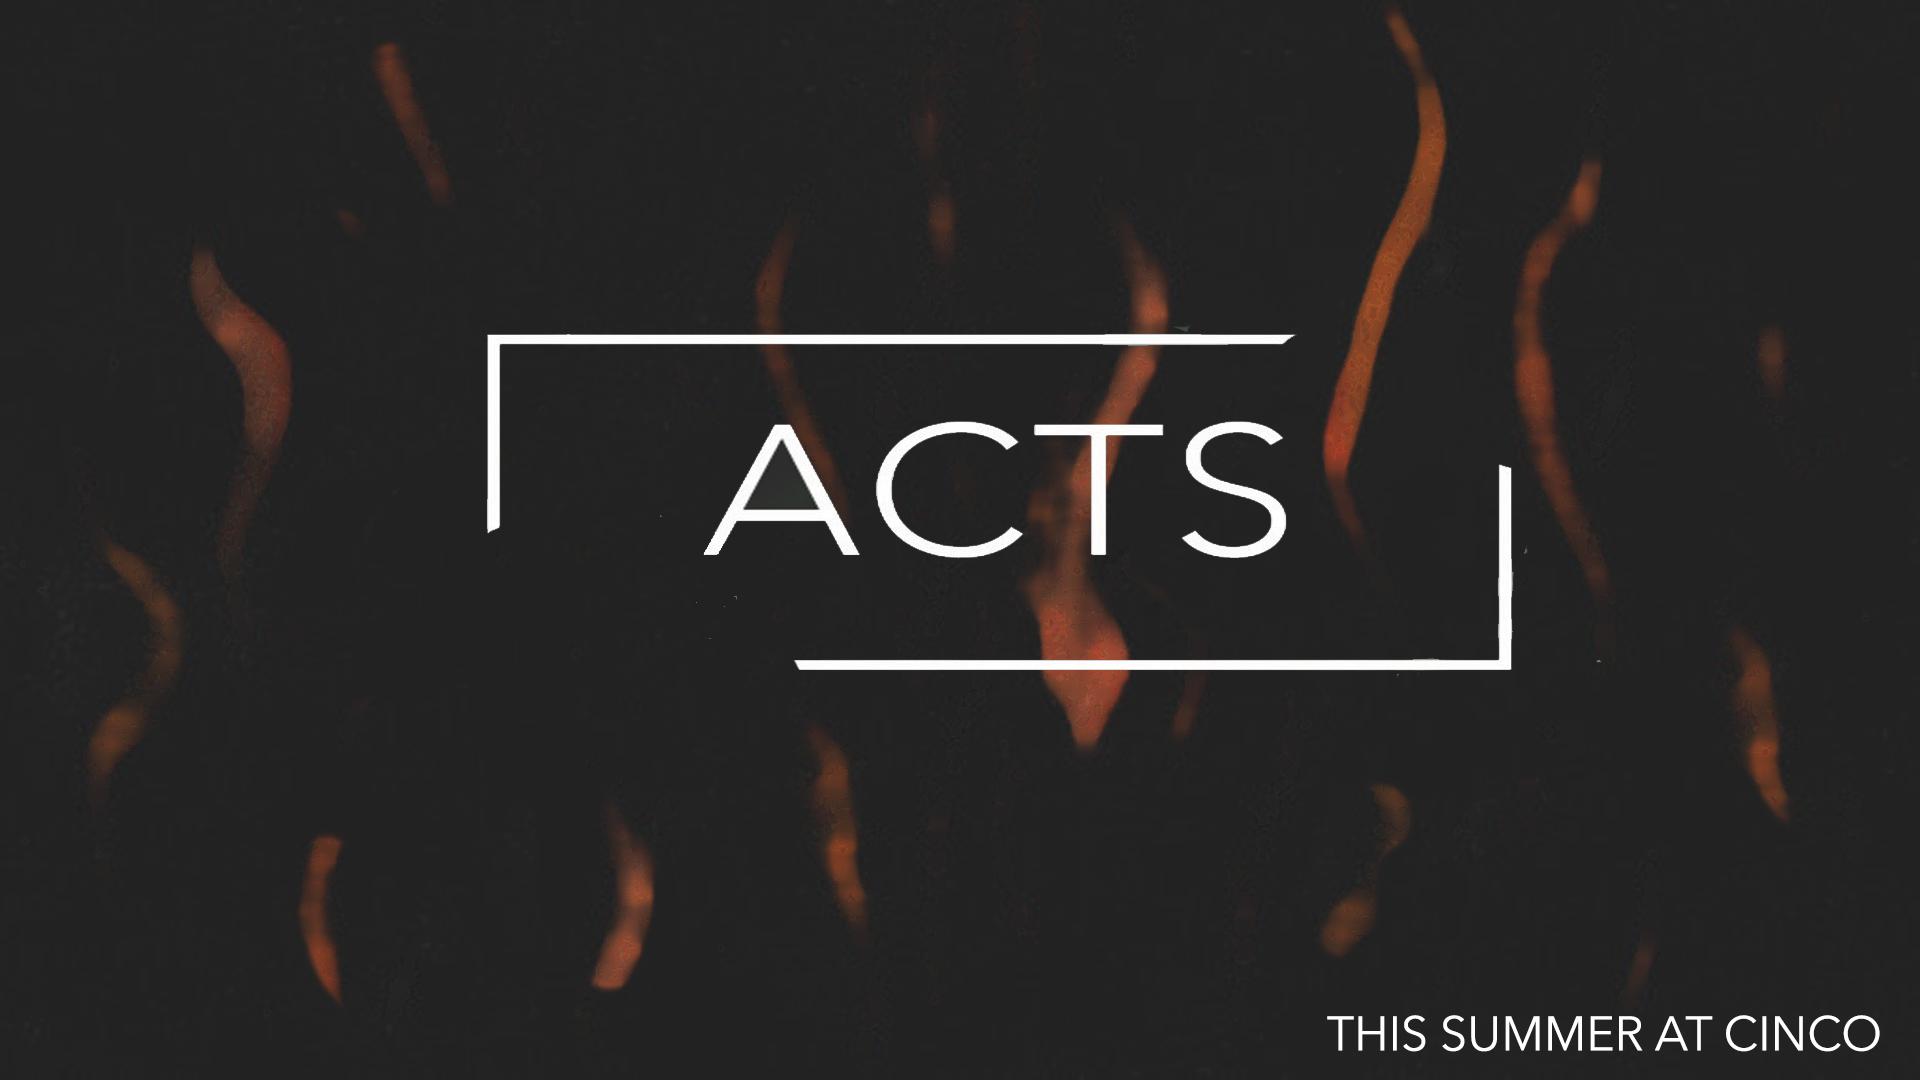 ActsGraphic.jpg